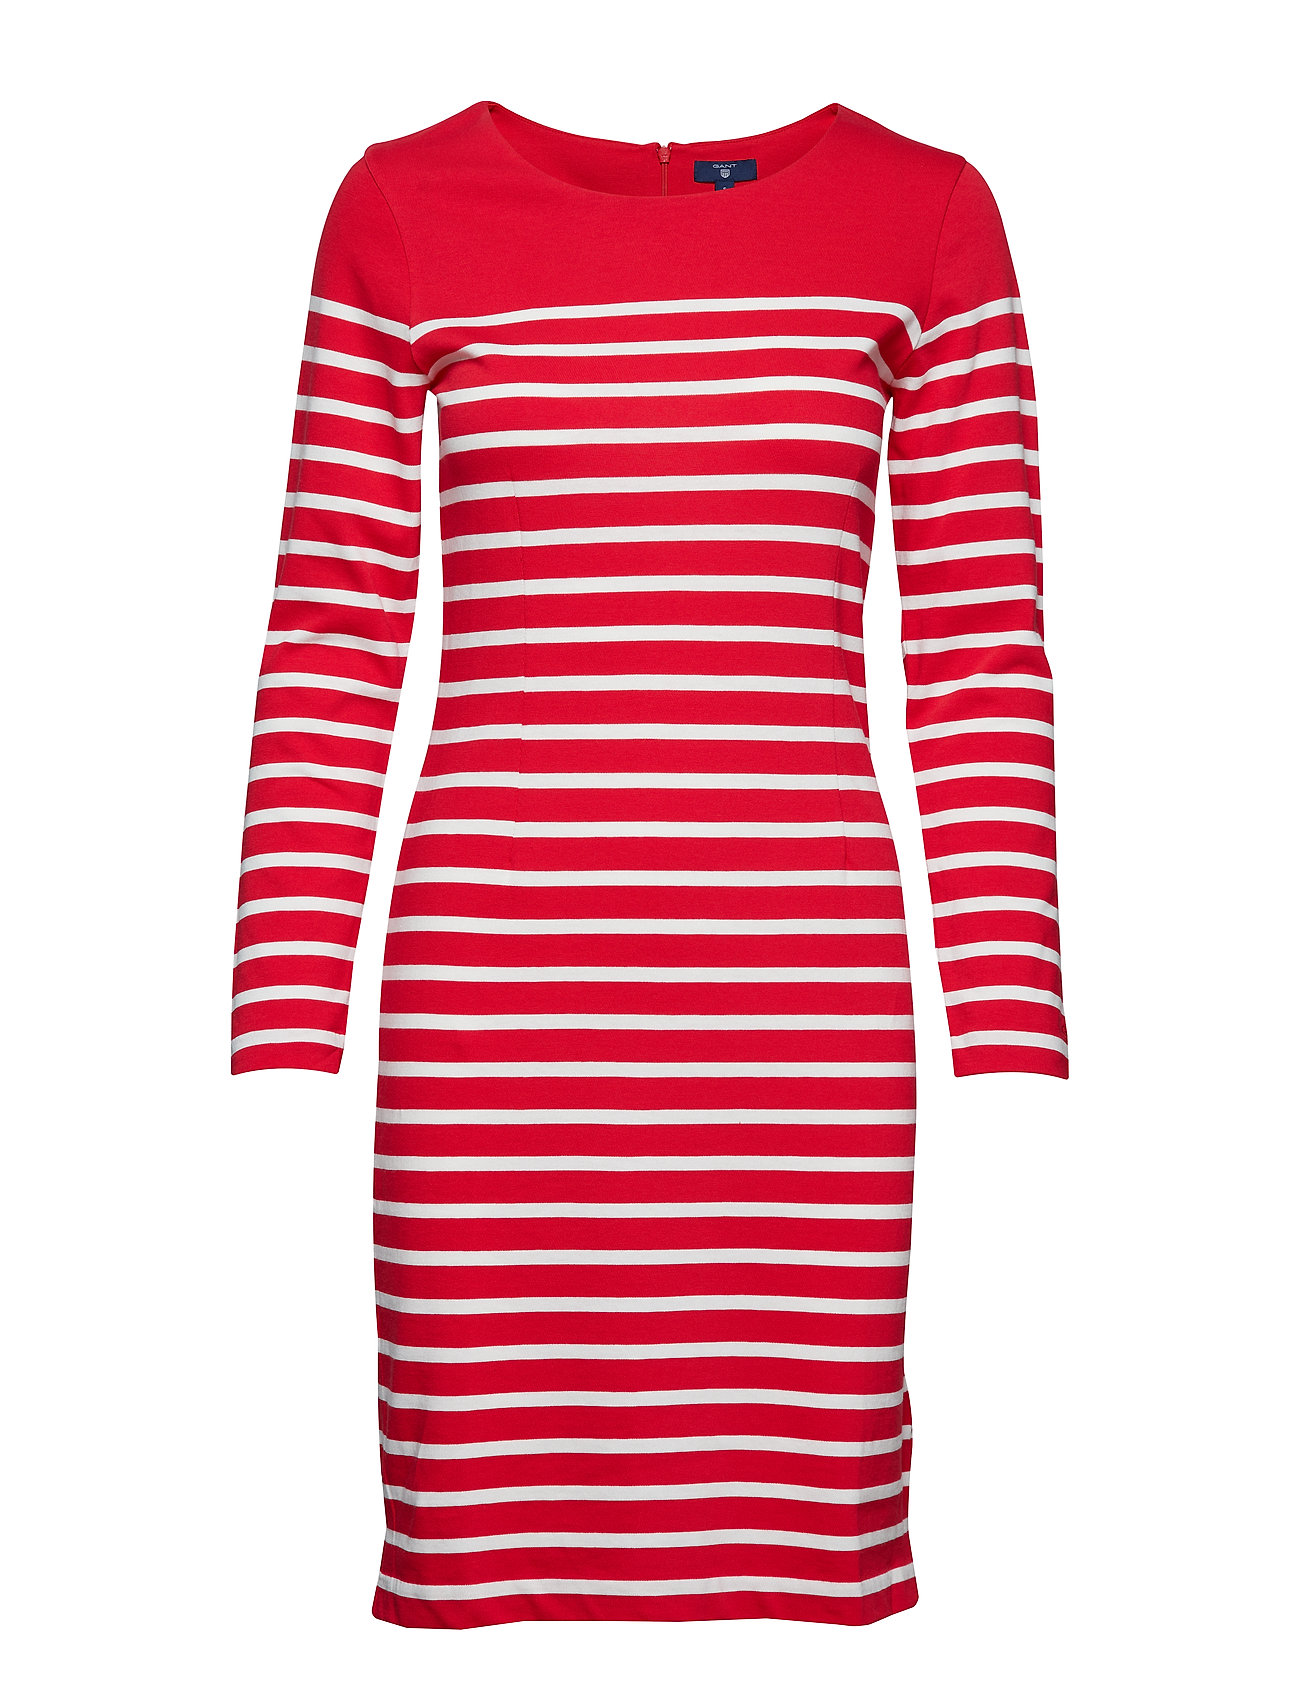 Gant O2. STRIPED SHIFT DRESS - BRIGHT RED